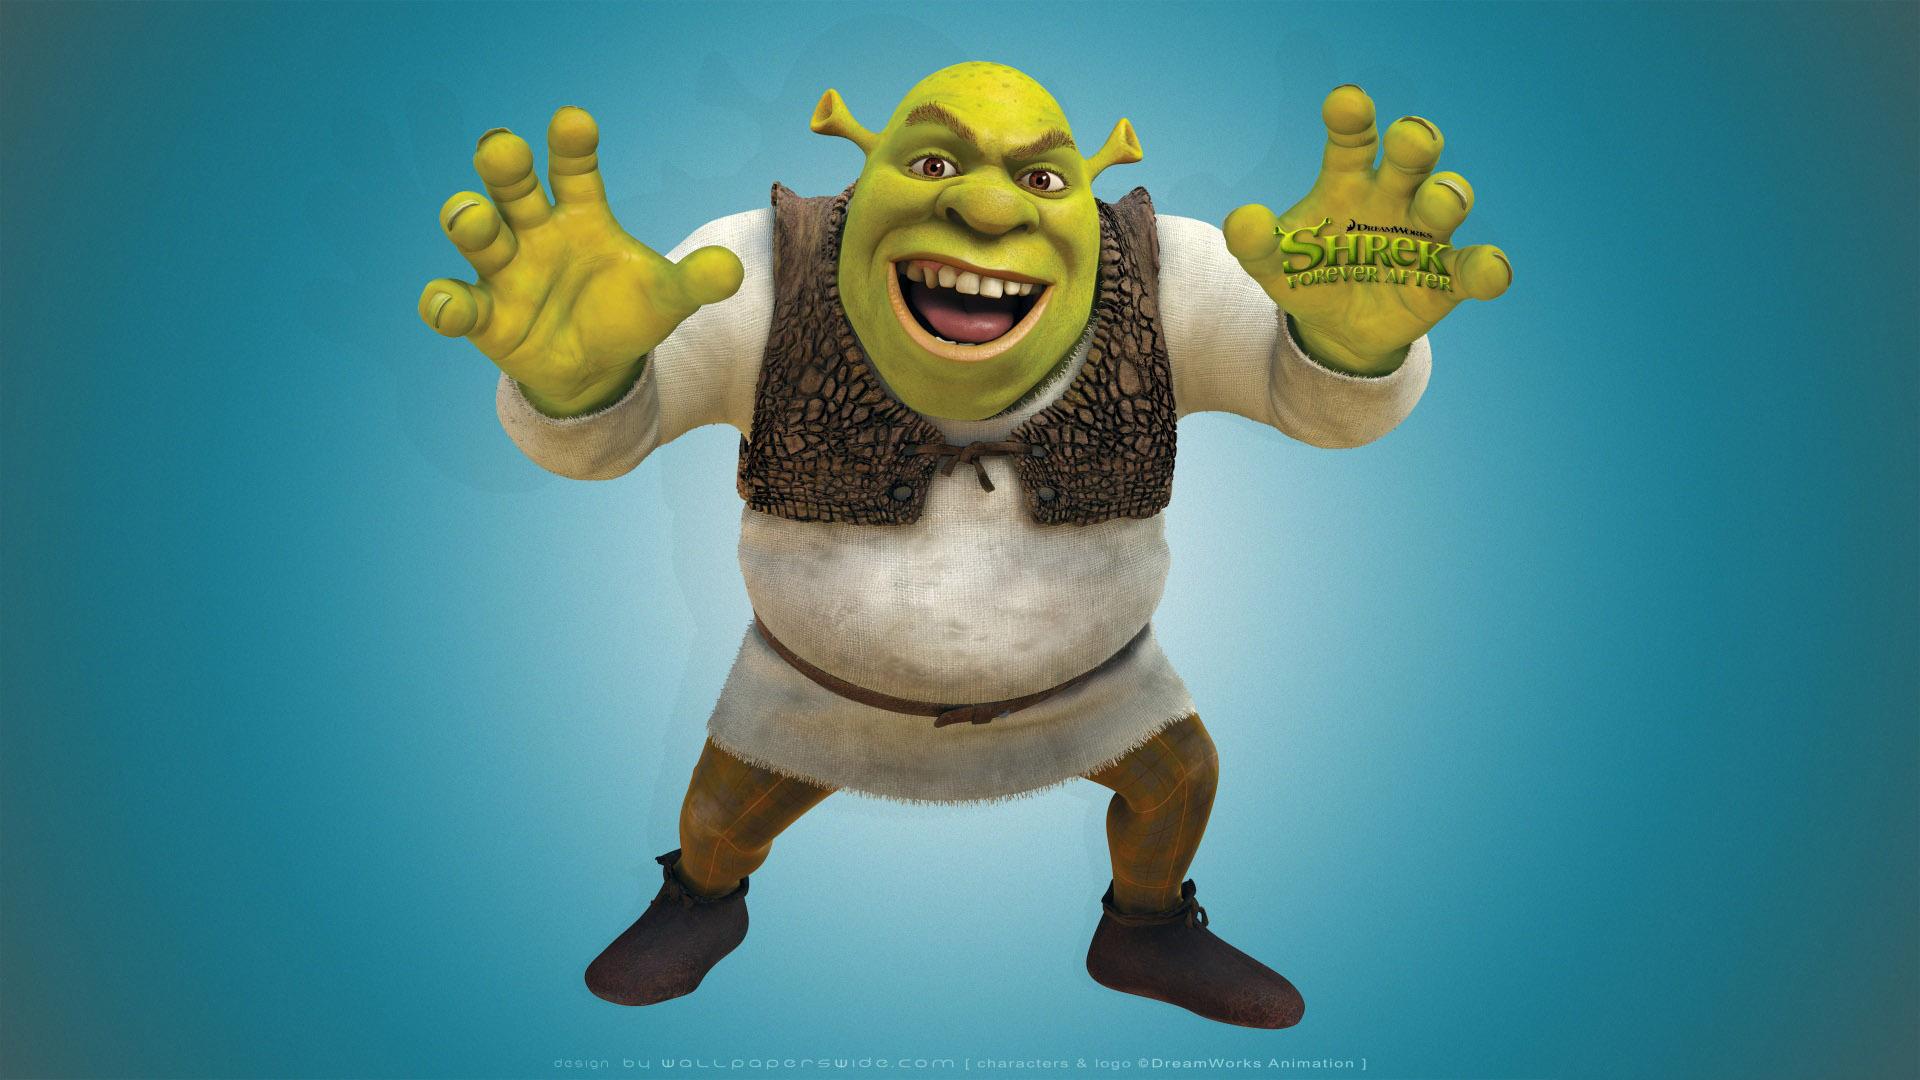 Shrek Forever After Full HD Wallpaper and Background Image ...